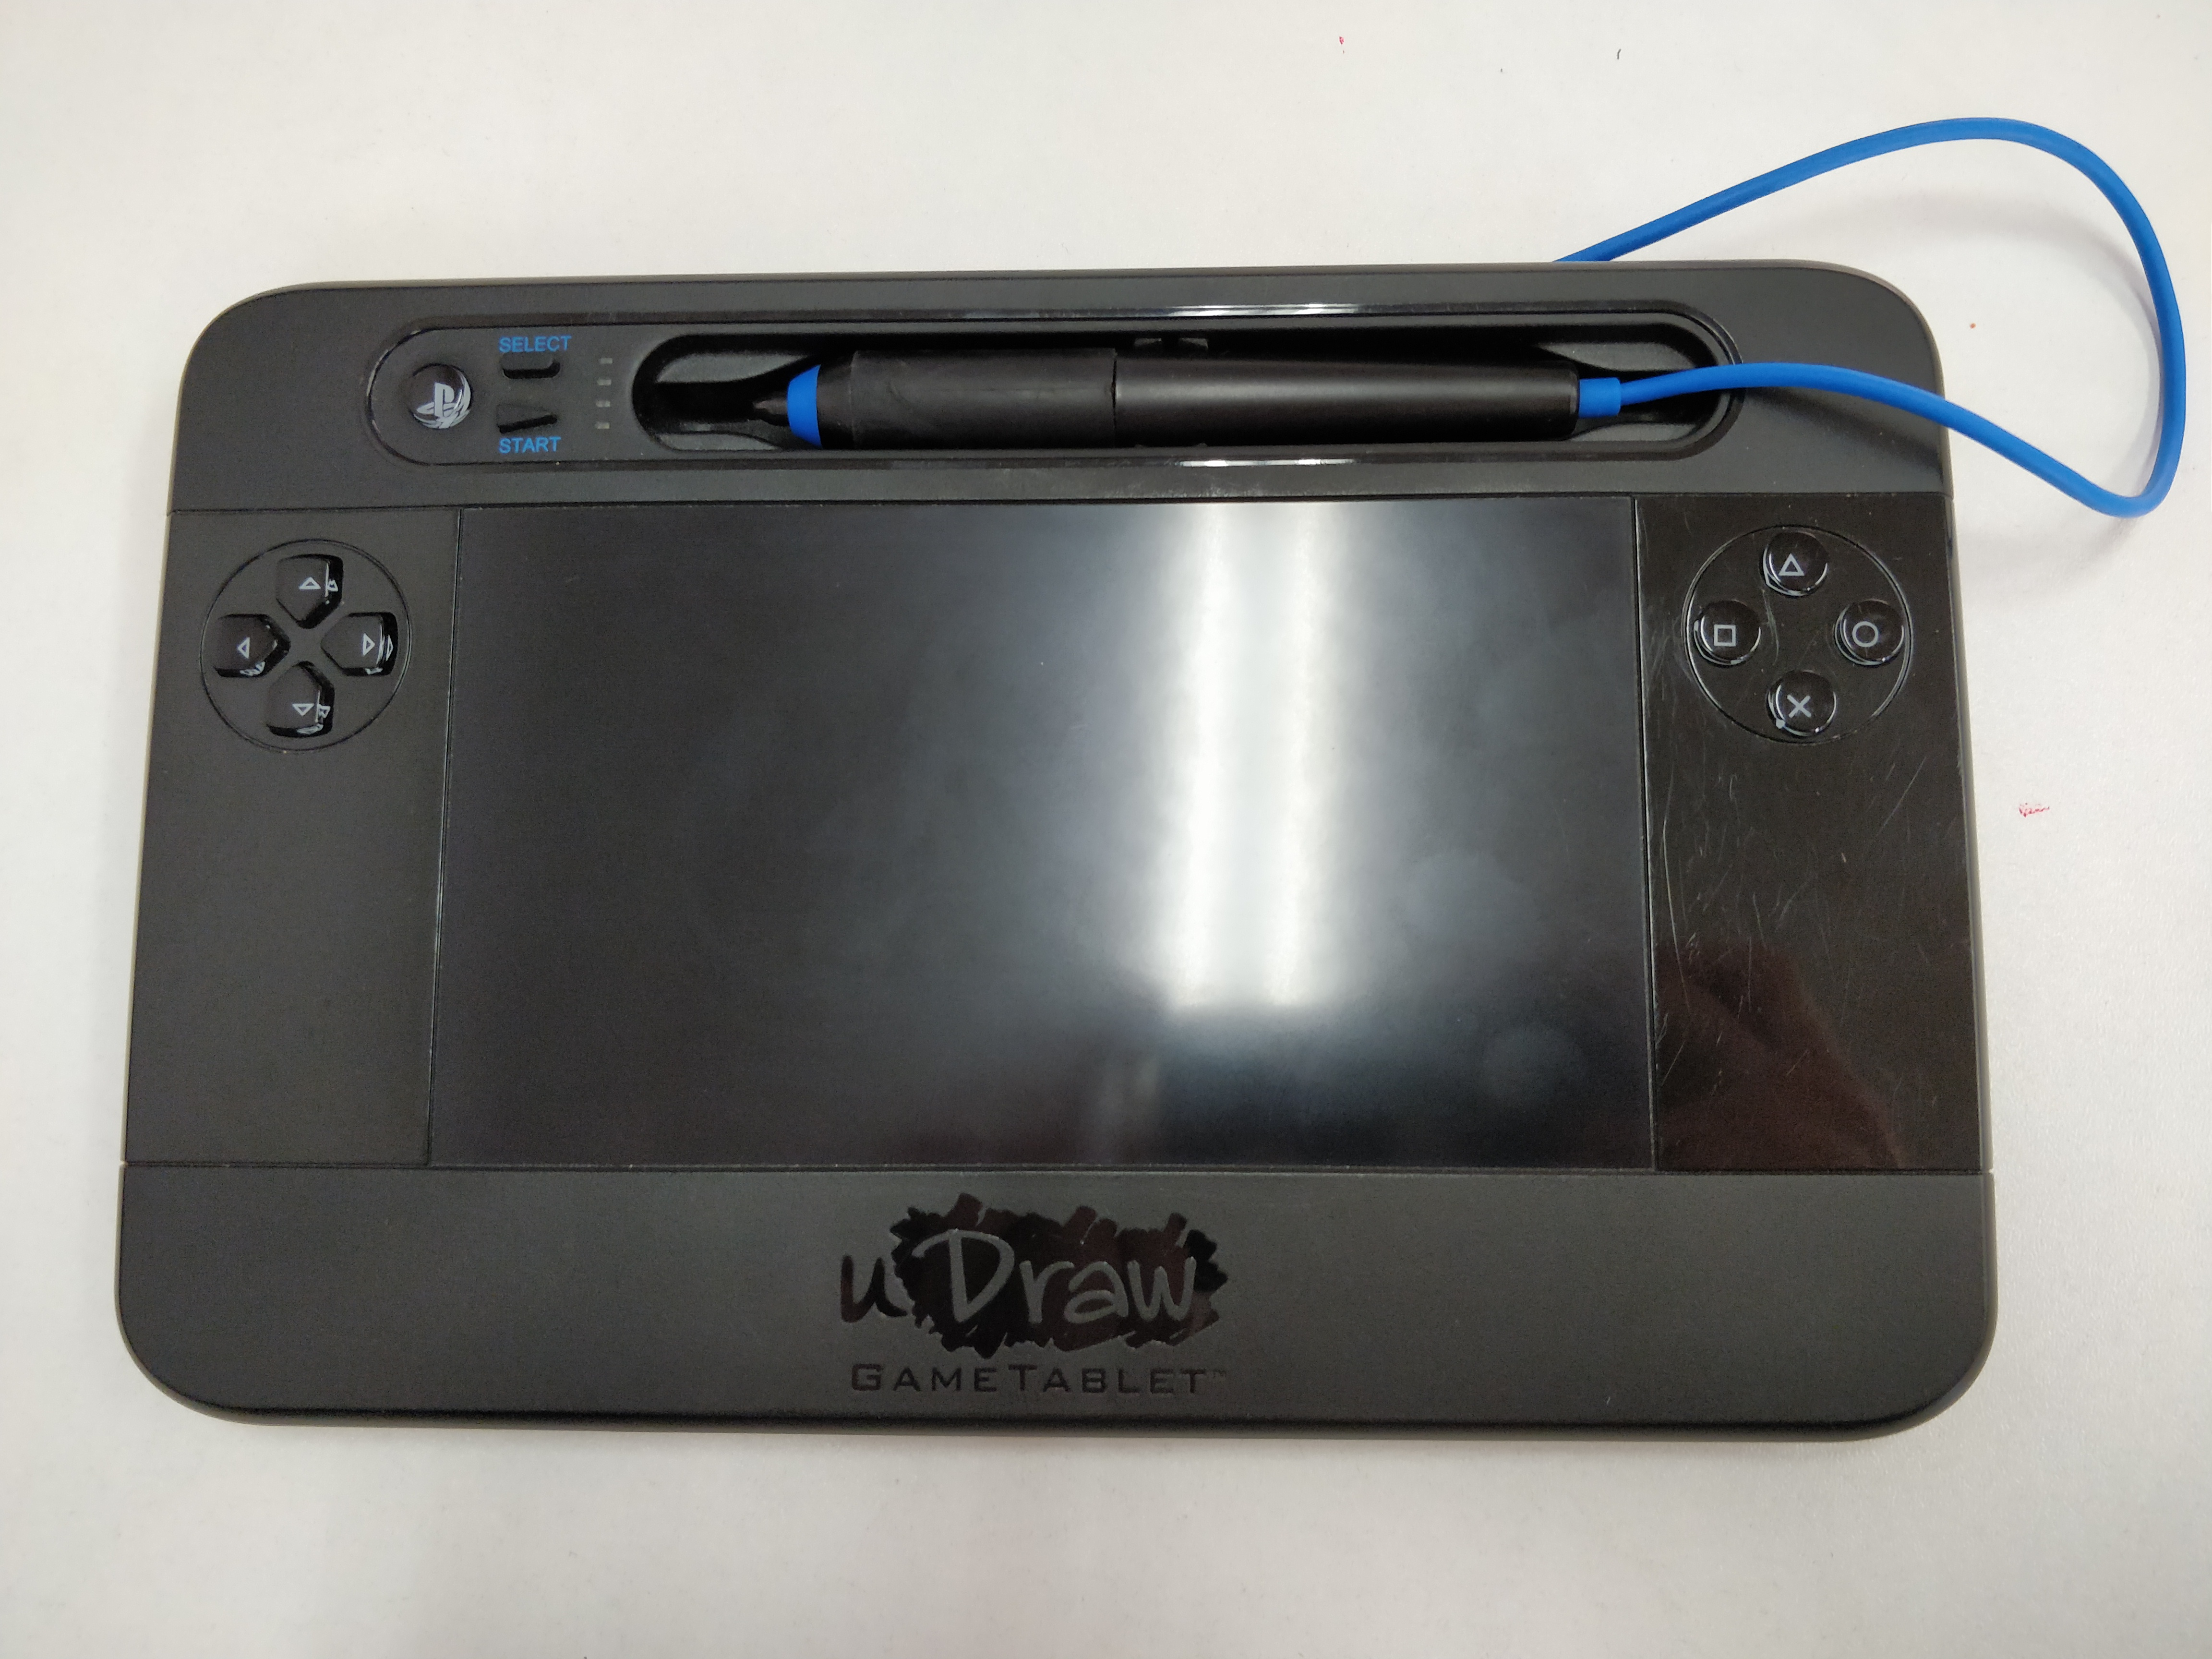 [PS3] Udraw Tablet - černý (estetická vada)